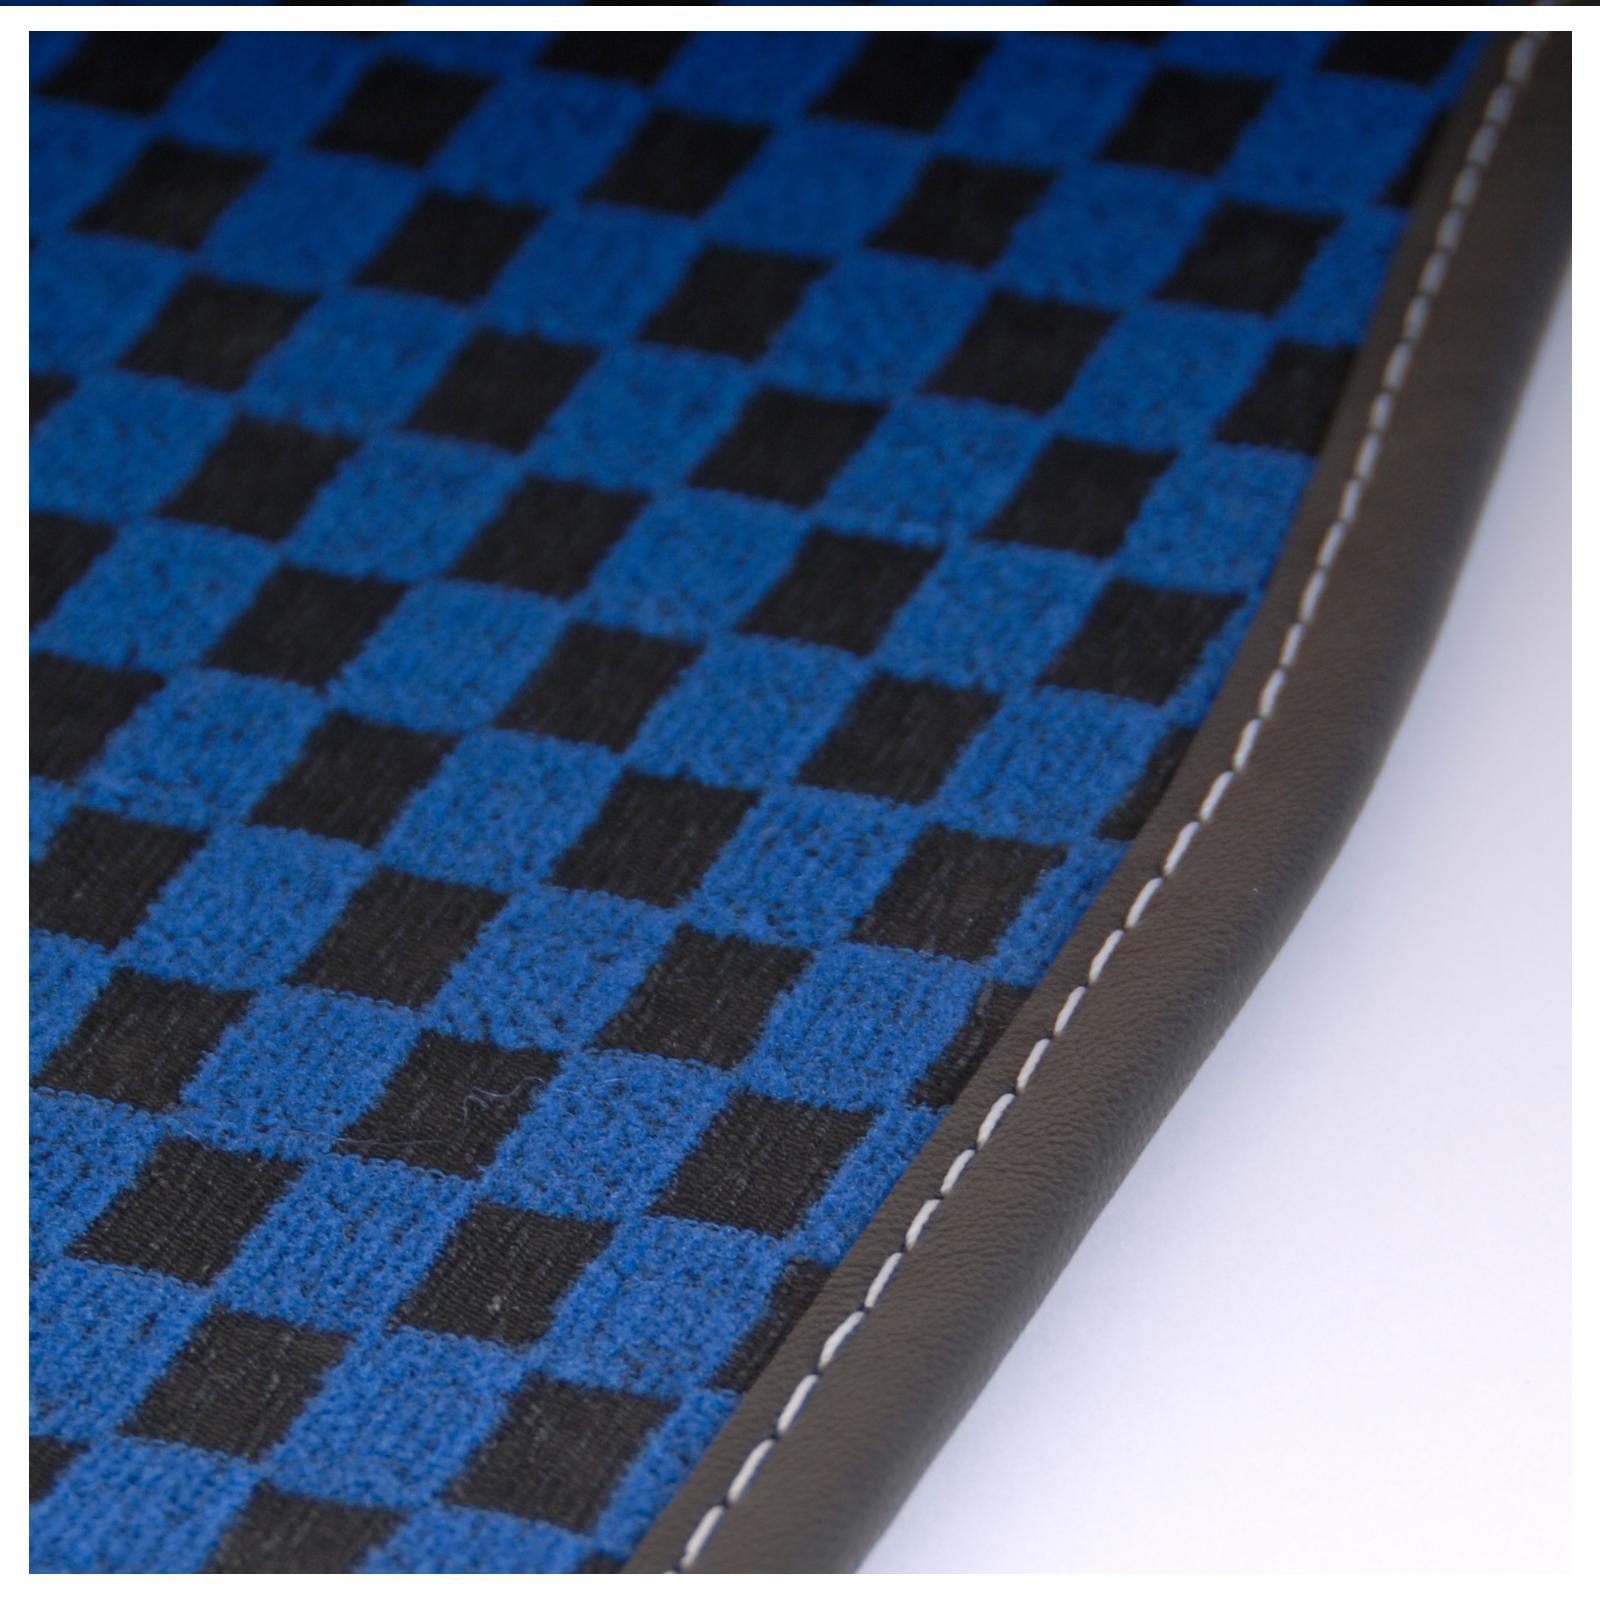 Checkered Mat: BMW 3 Series (E93) (2007 Onwards) BLUE CHECKERED Tailored